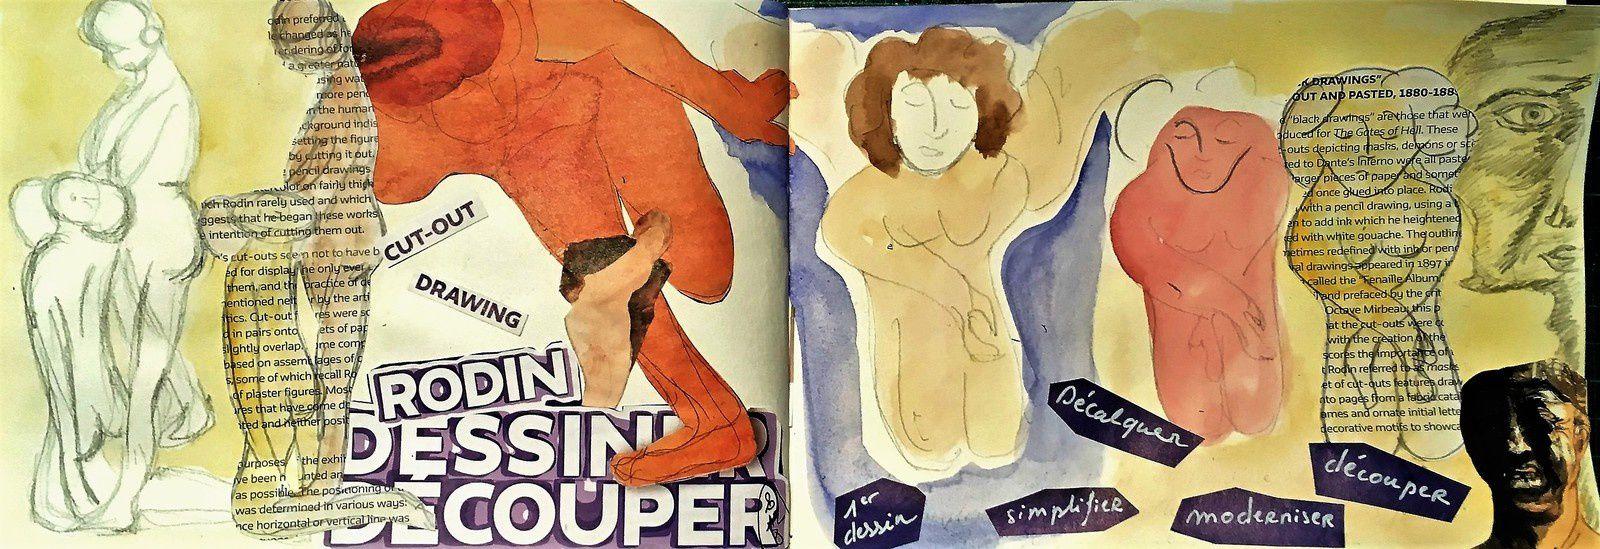 Rodin, dessiner , couper